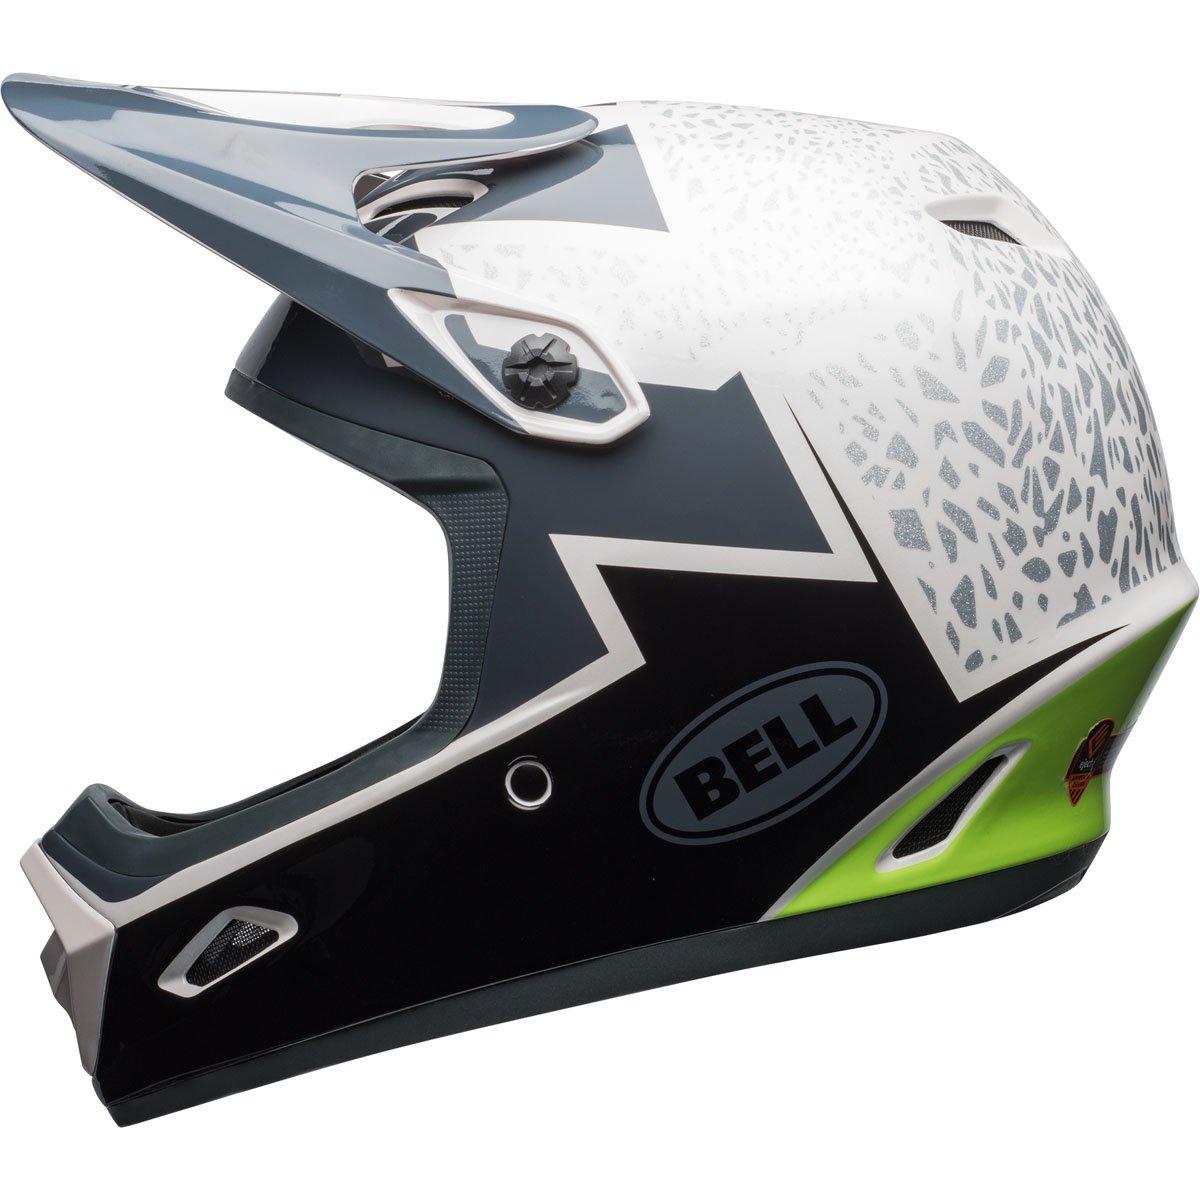 Bell transfer-9 Bikeヘルメット Small Gloss Pear/Lead/Silver Revolution B076KZFTWW